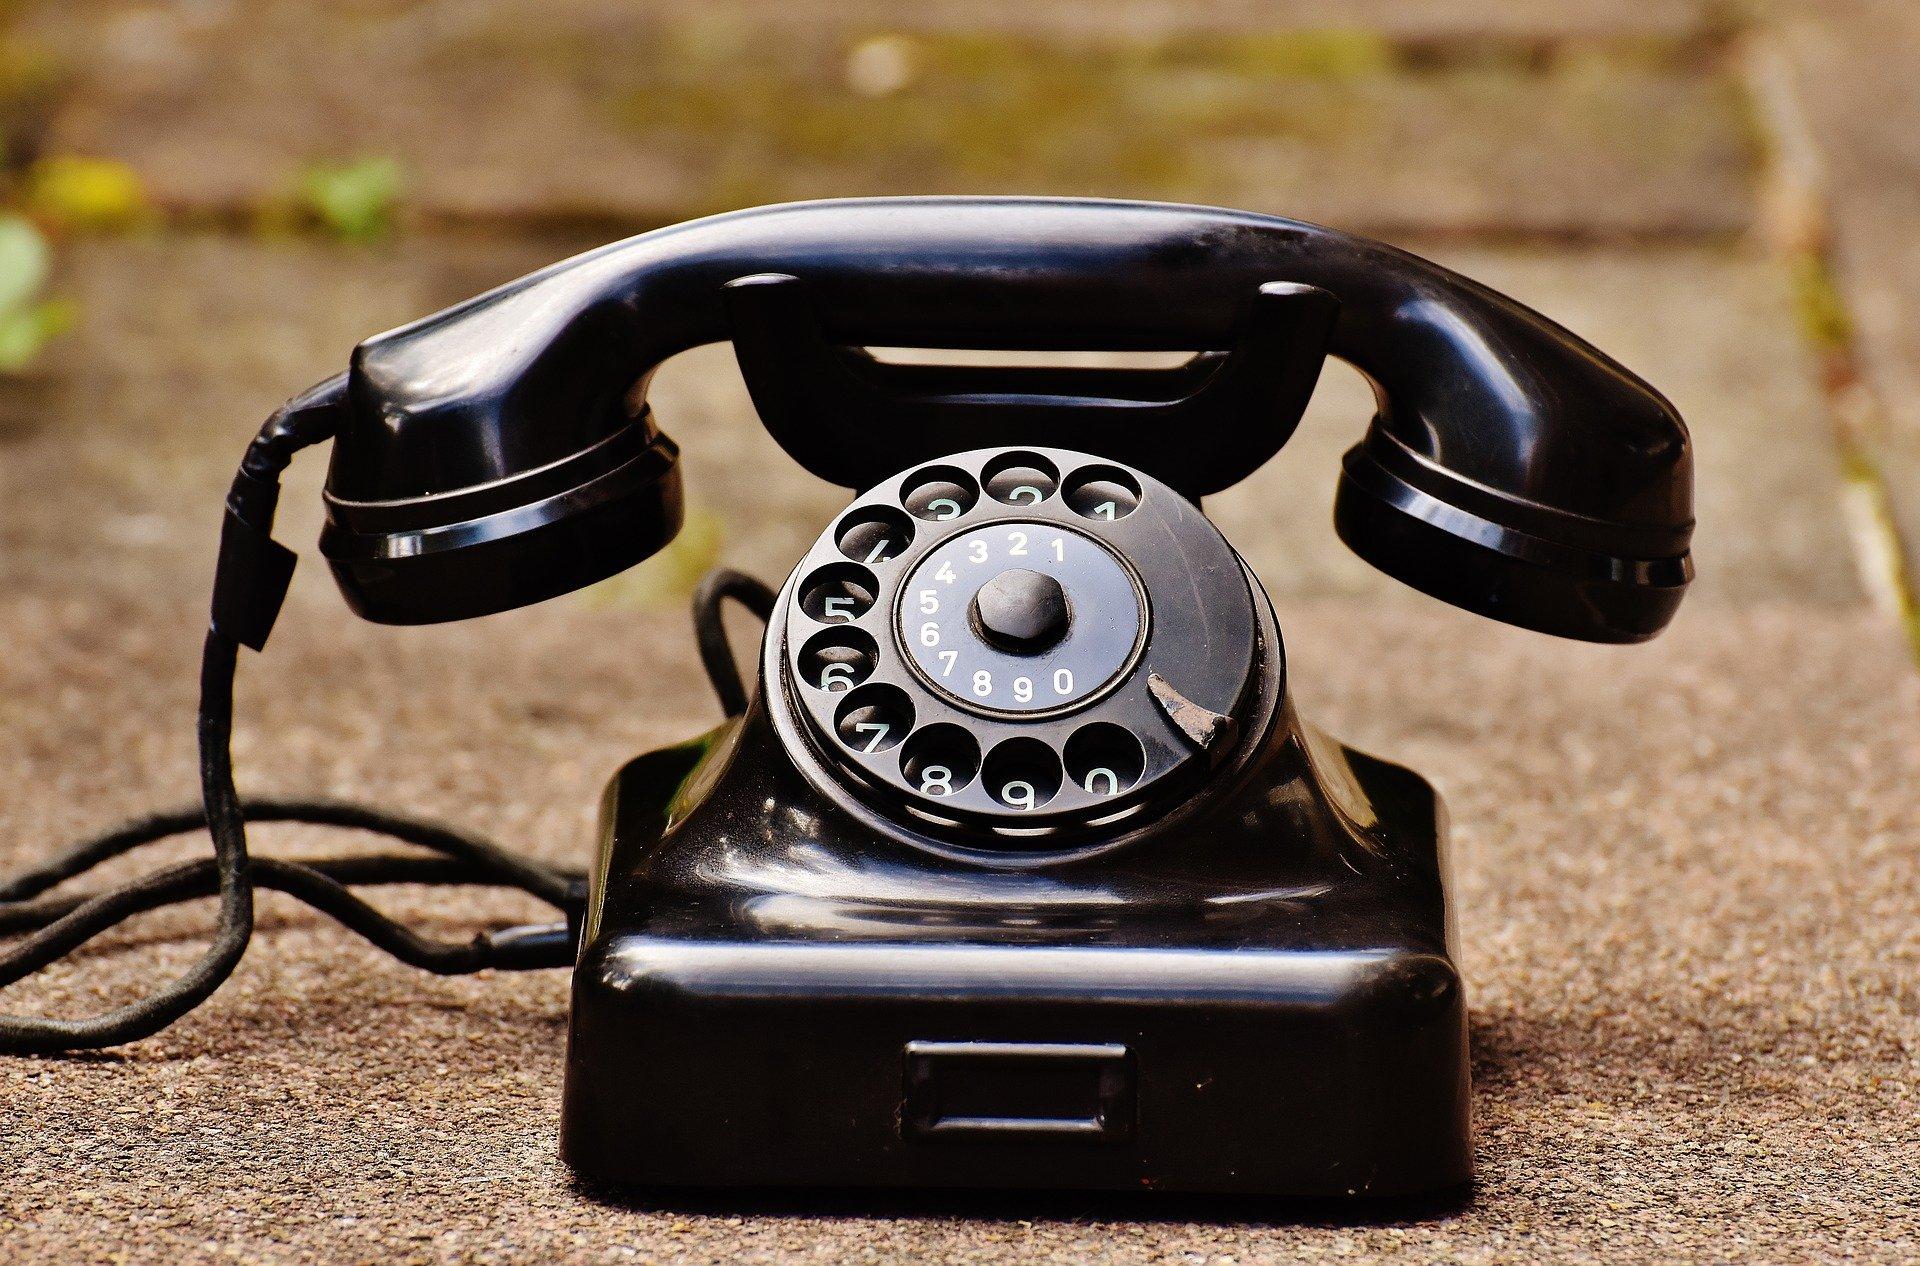 phone-1610185_1920